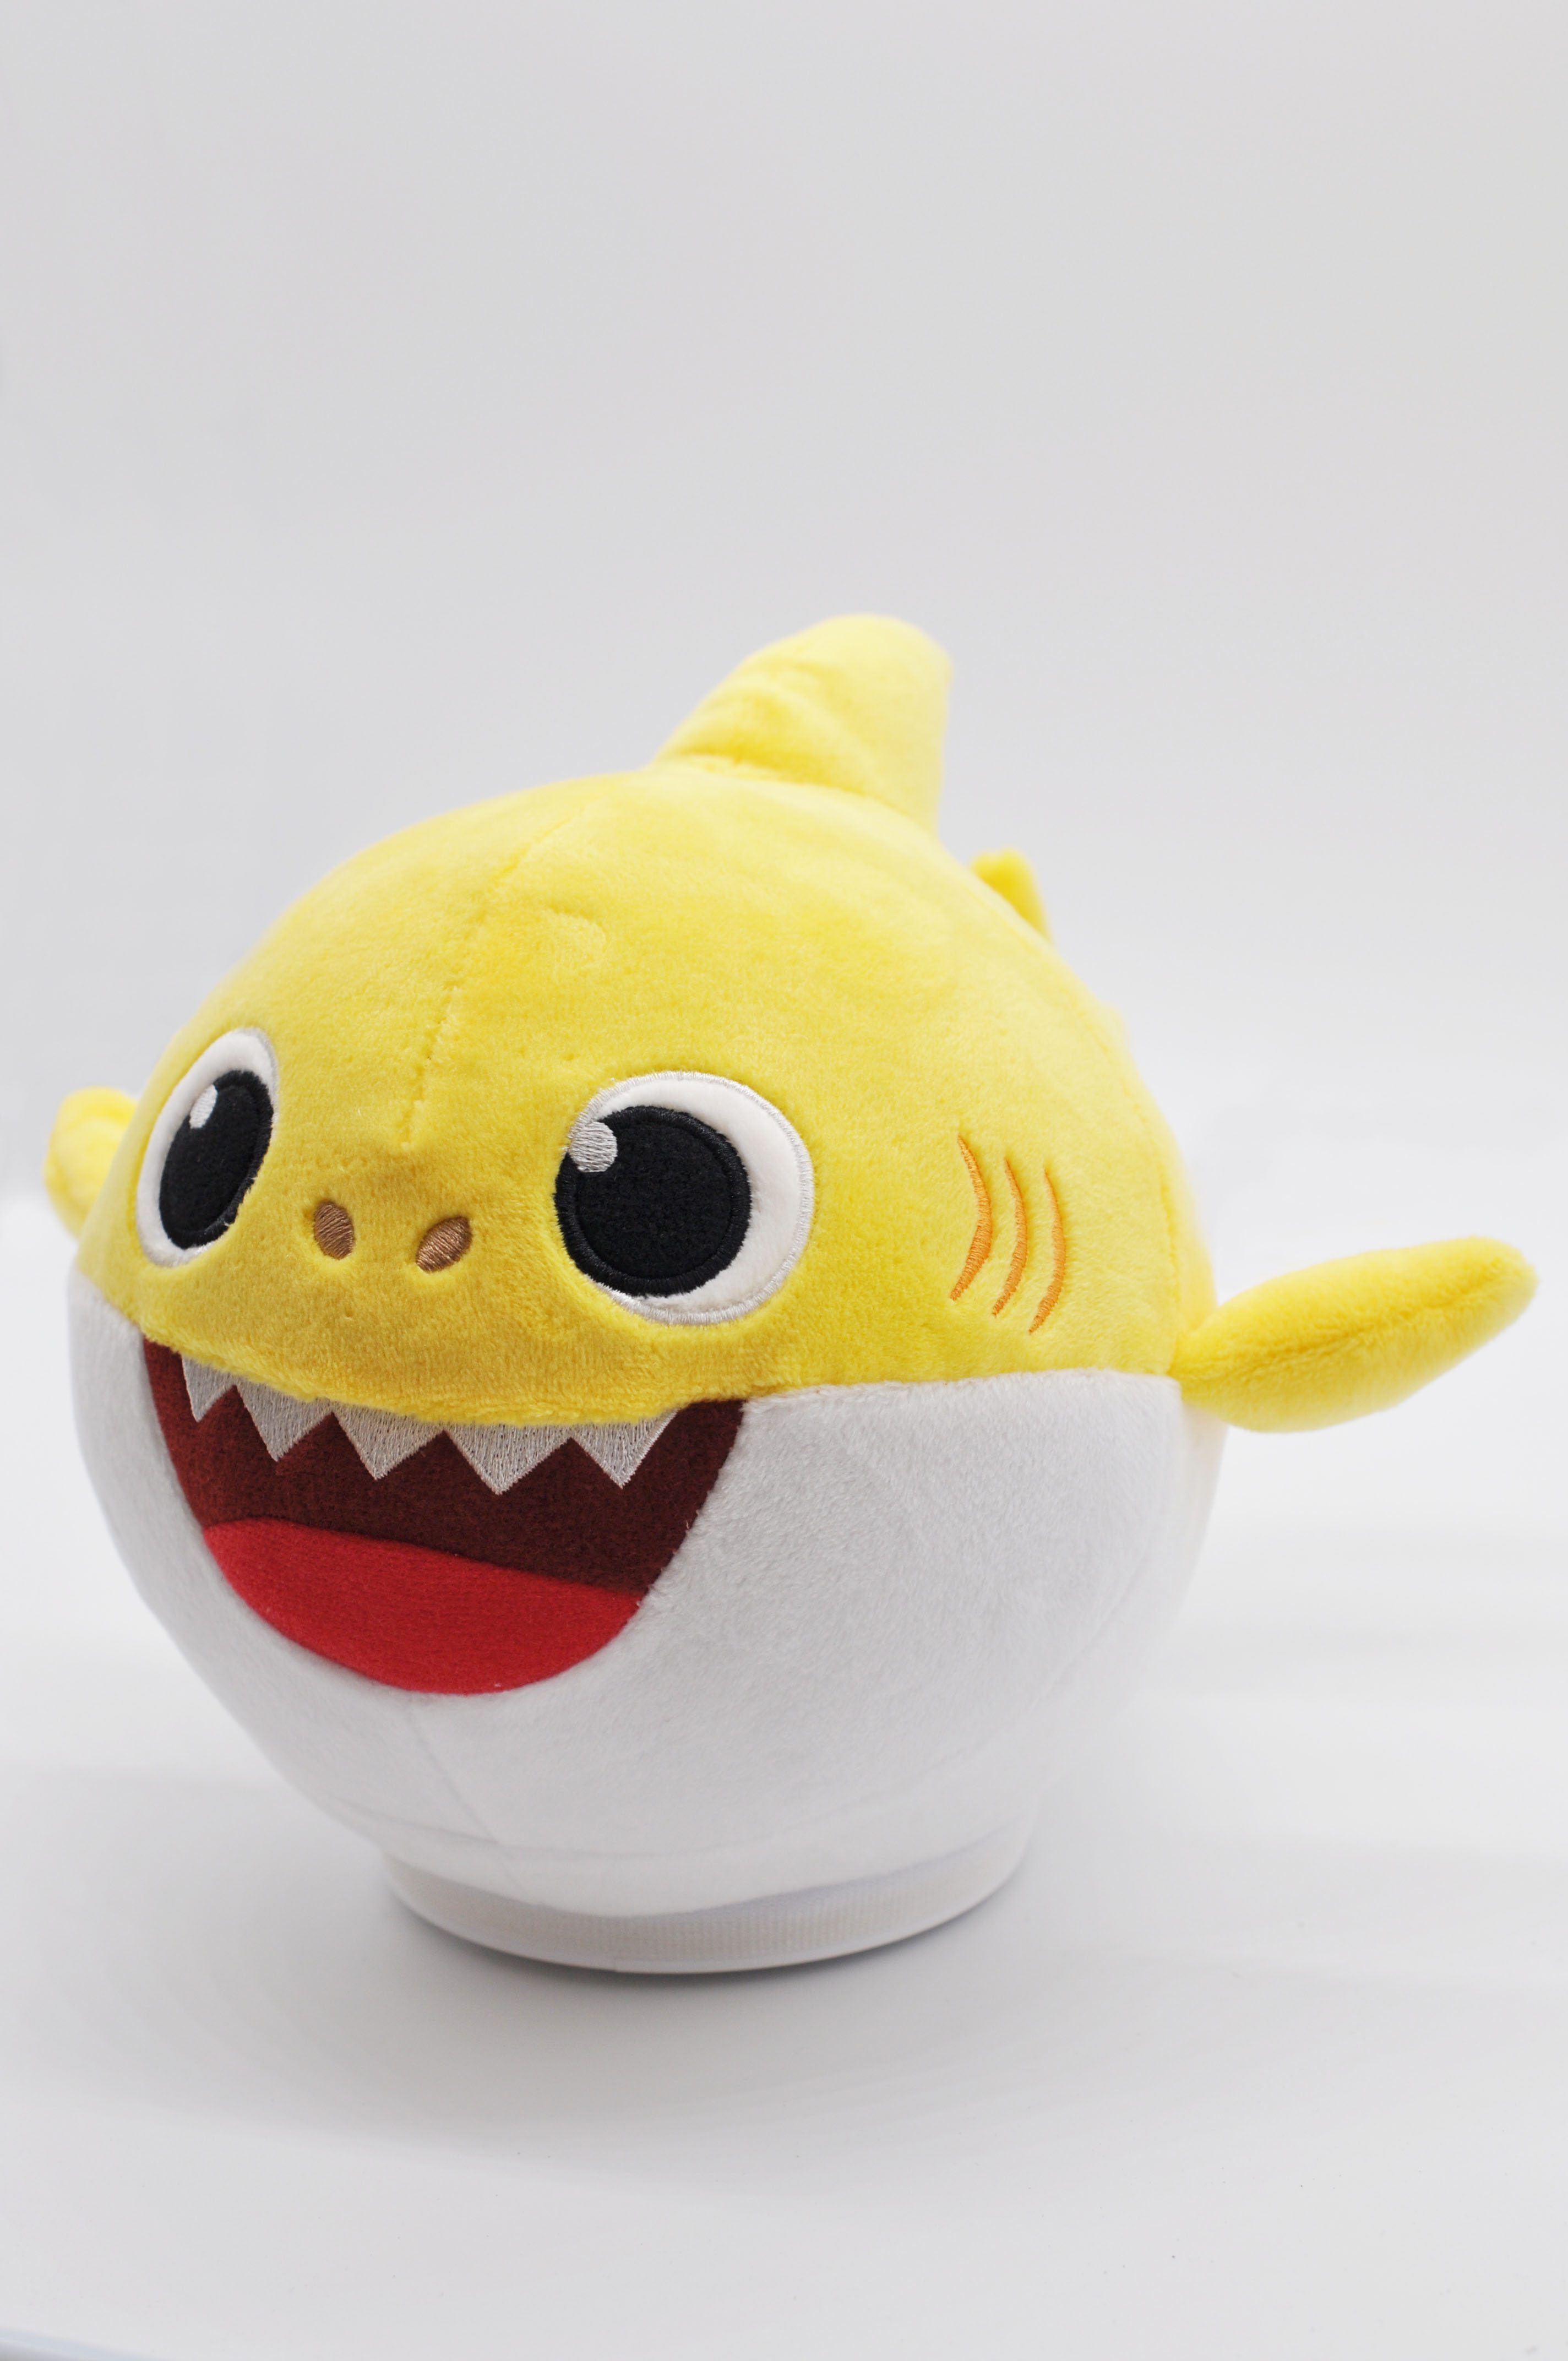 SS120510280000 Baby Shark Pinkfong Dancing Babyshark (7)